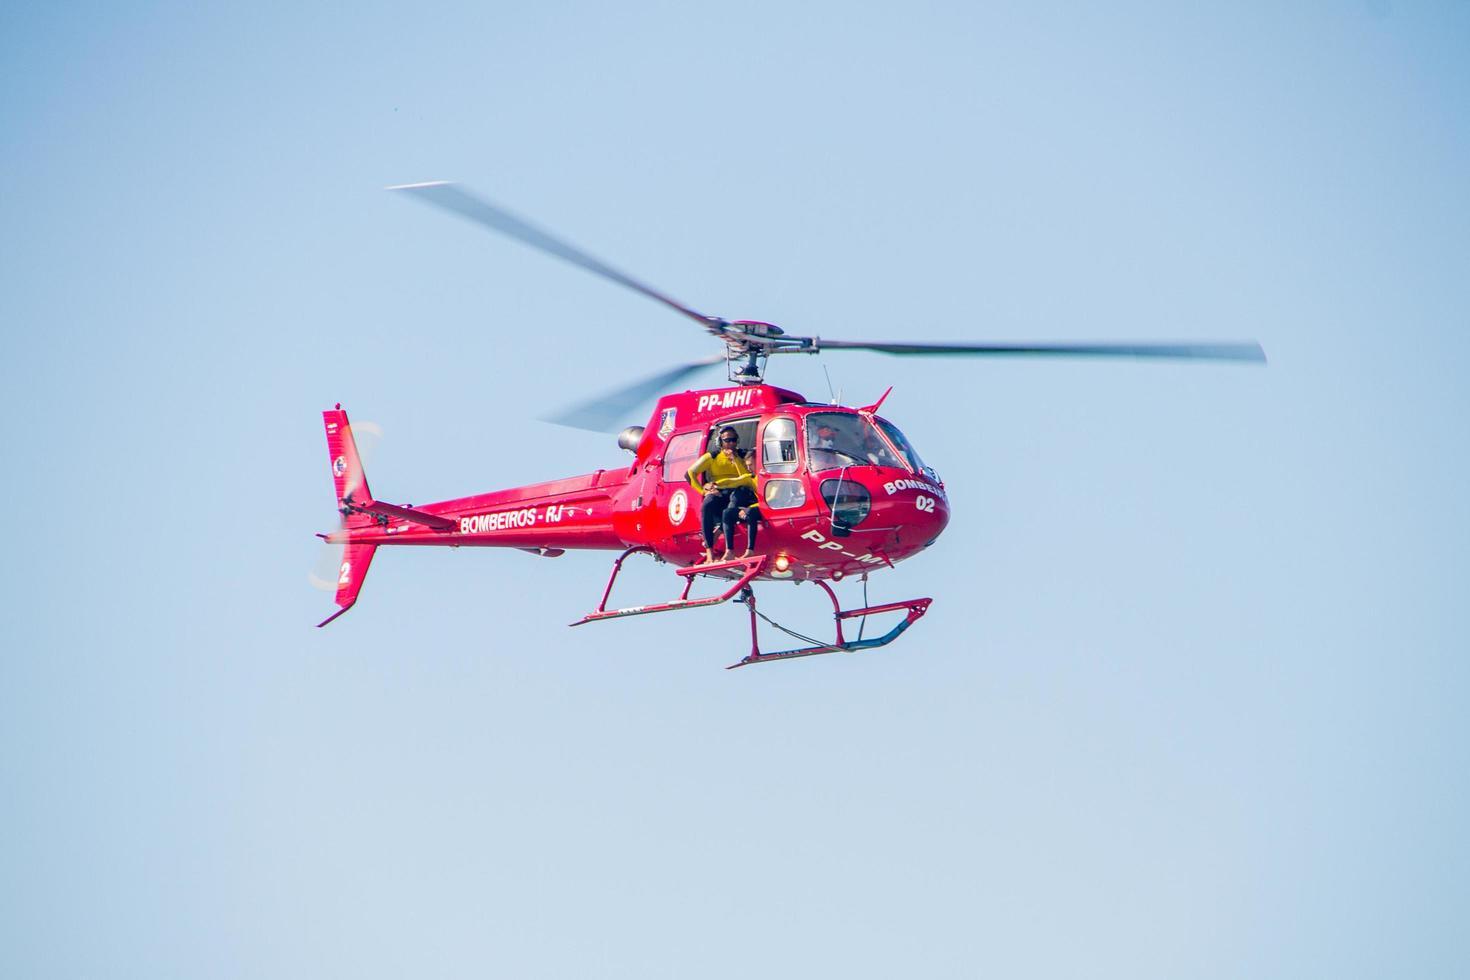 rio de janeiro, brasile, 2015 - elicottero dei vigili del fuoco nel cielo foto